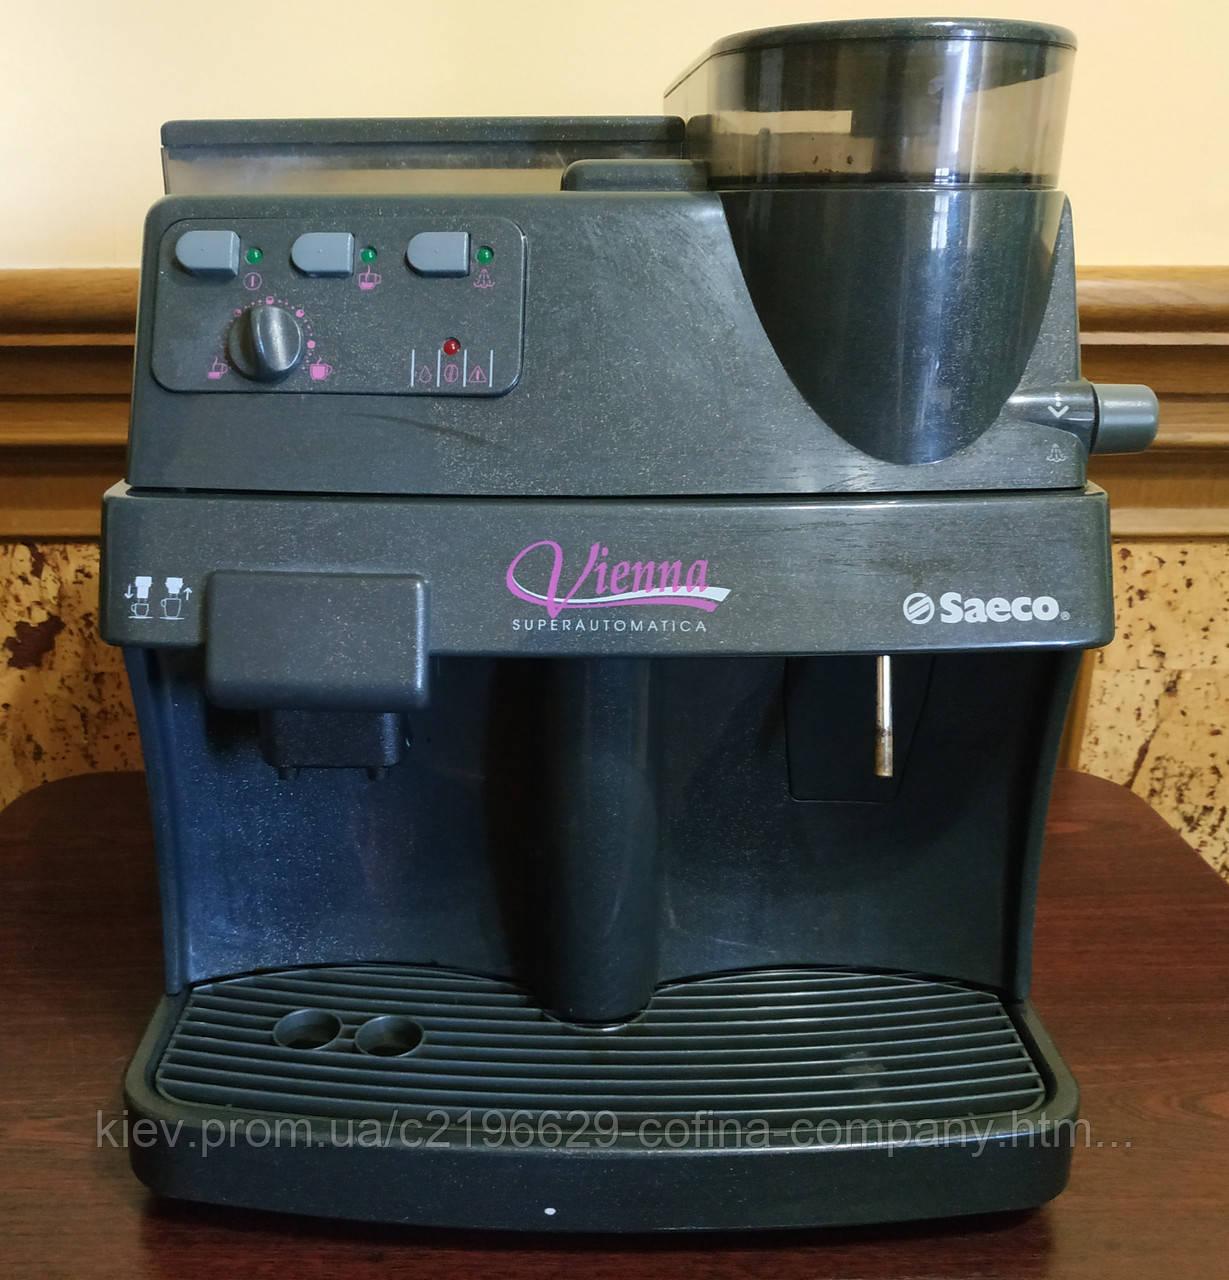 Saeco Vienna Superavtomatica автоматическая кофемашина (с пробегом)